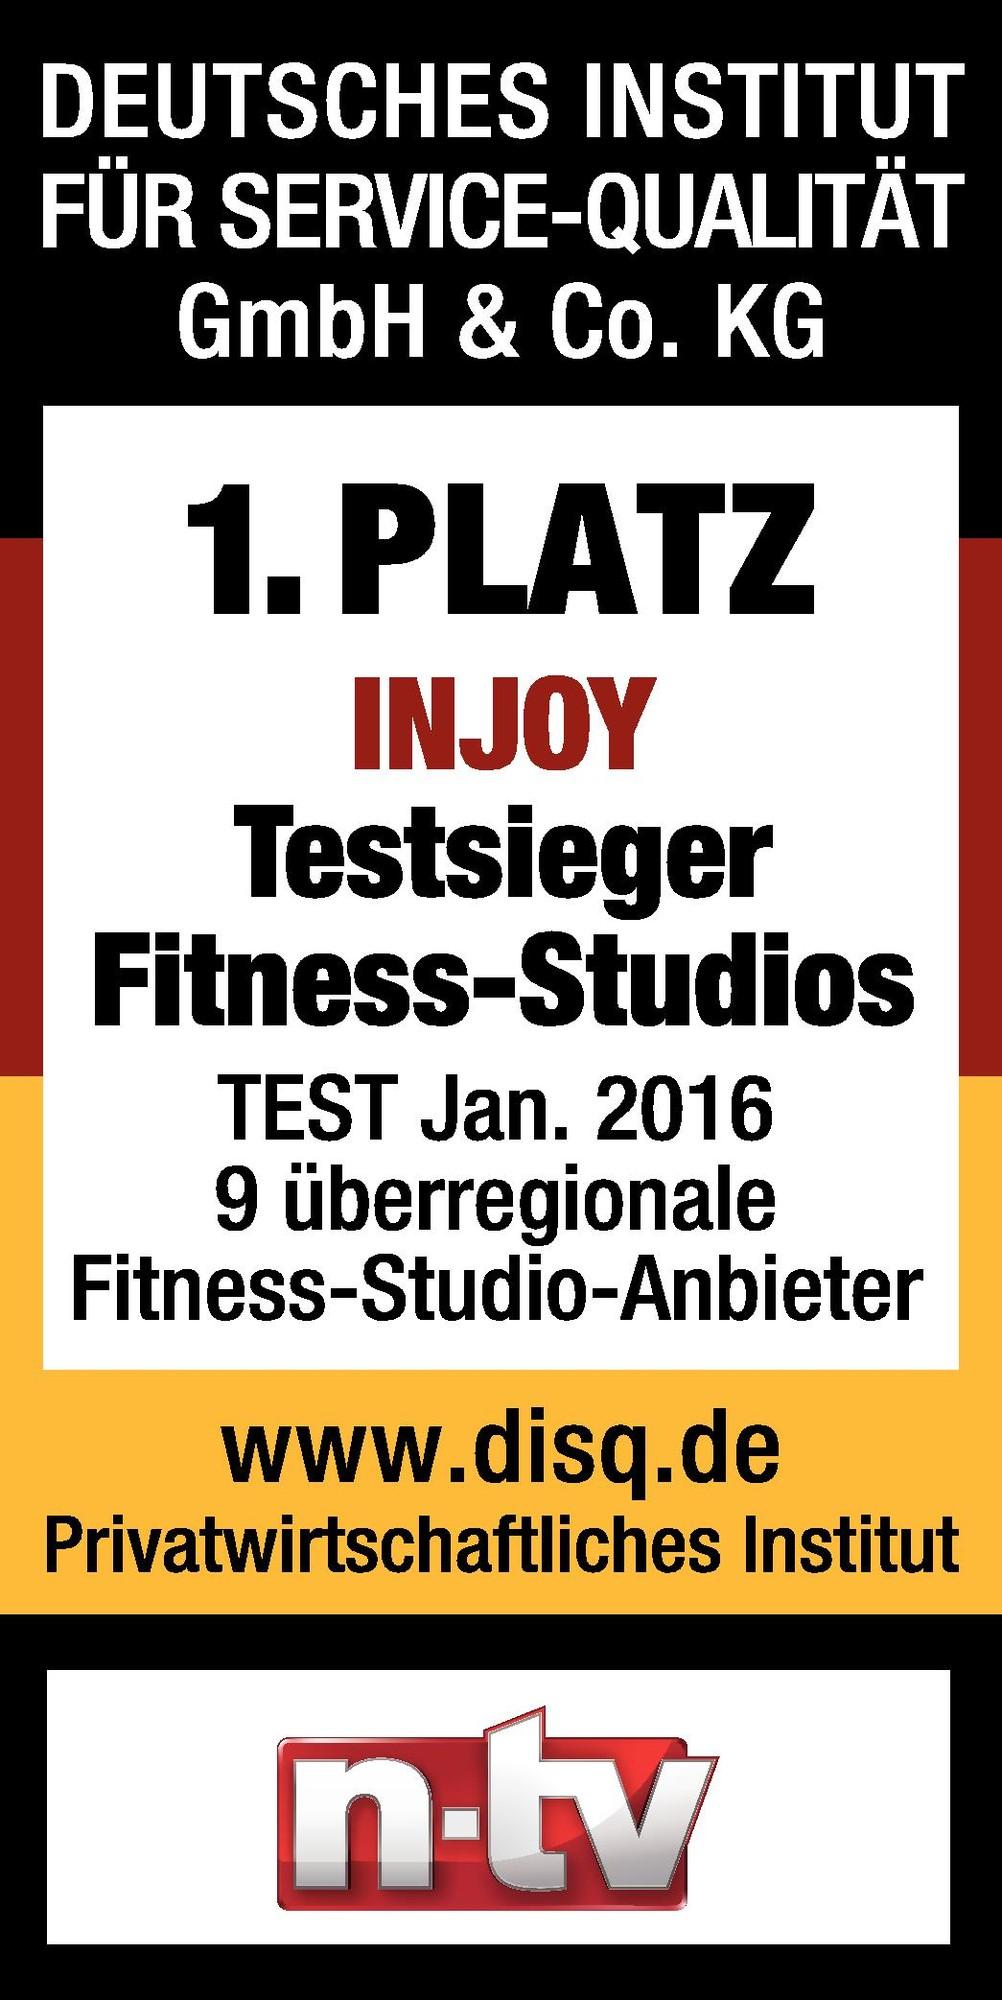 inportal4117_n-tv-Testsieger-Fitness-Studios-2016-INJOY-lpr